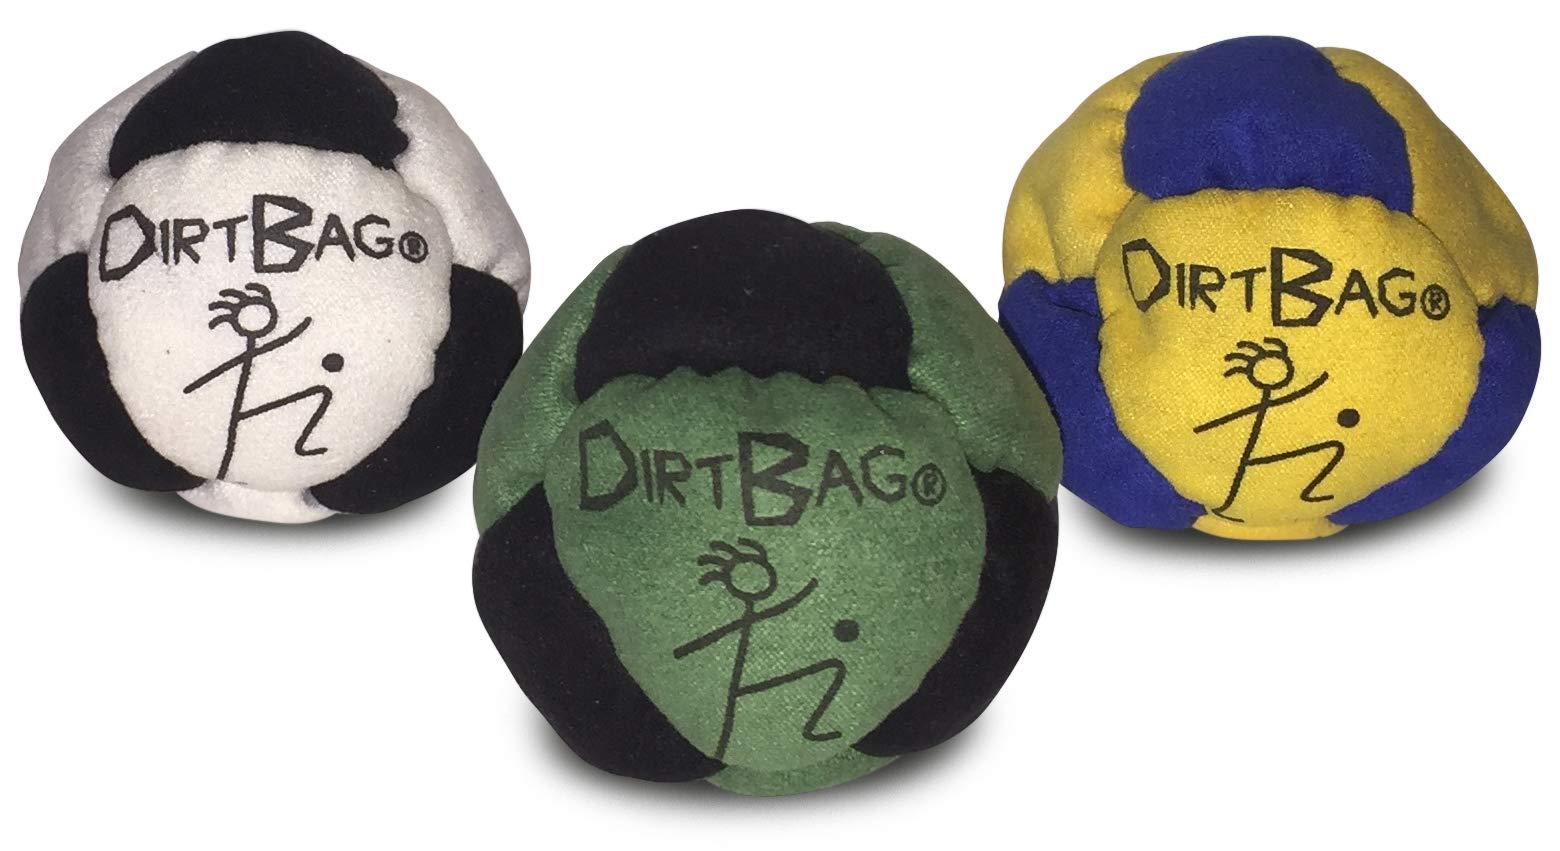 World Footbag Hacky Sack Footbag, 3 Pack by World Footbag